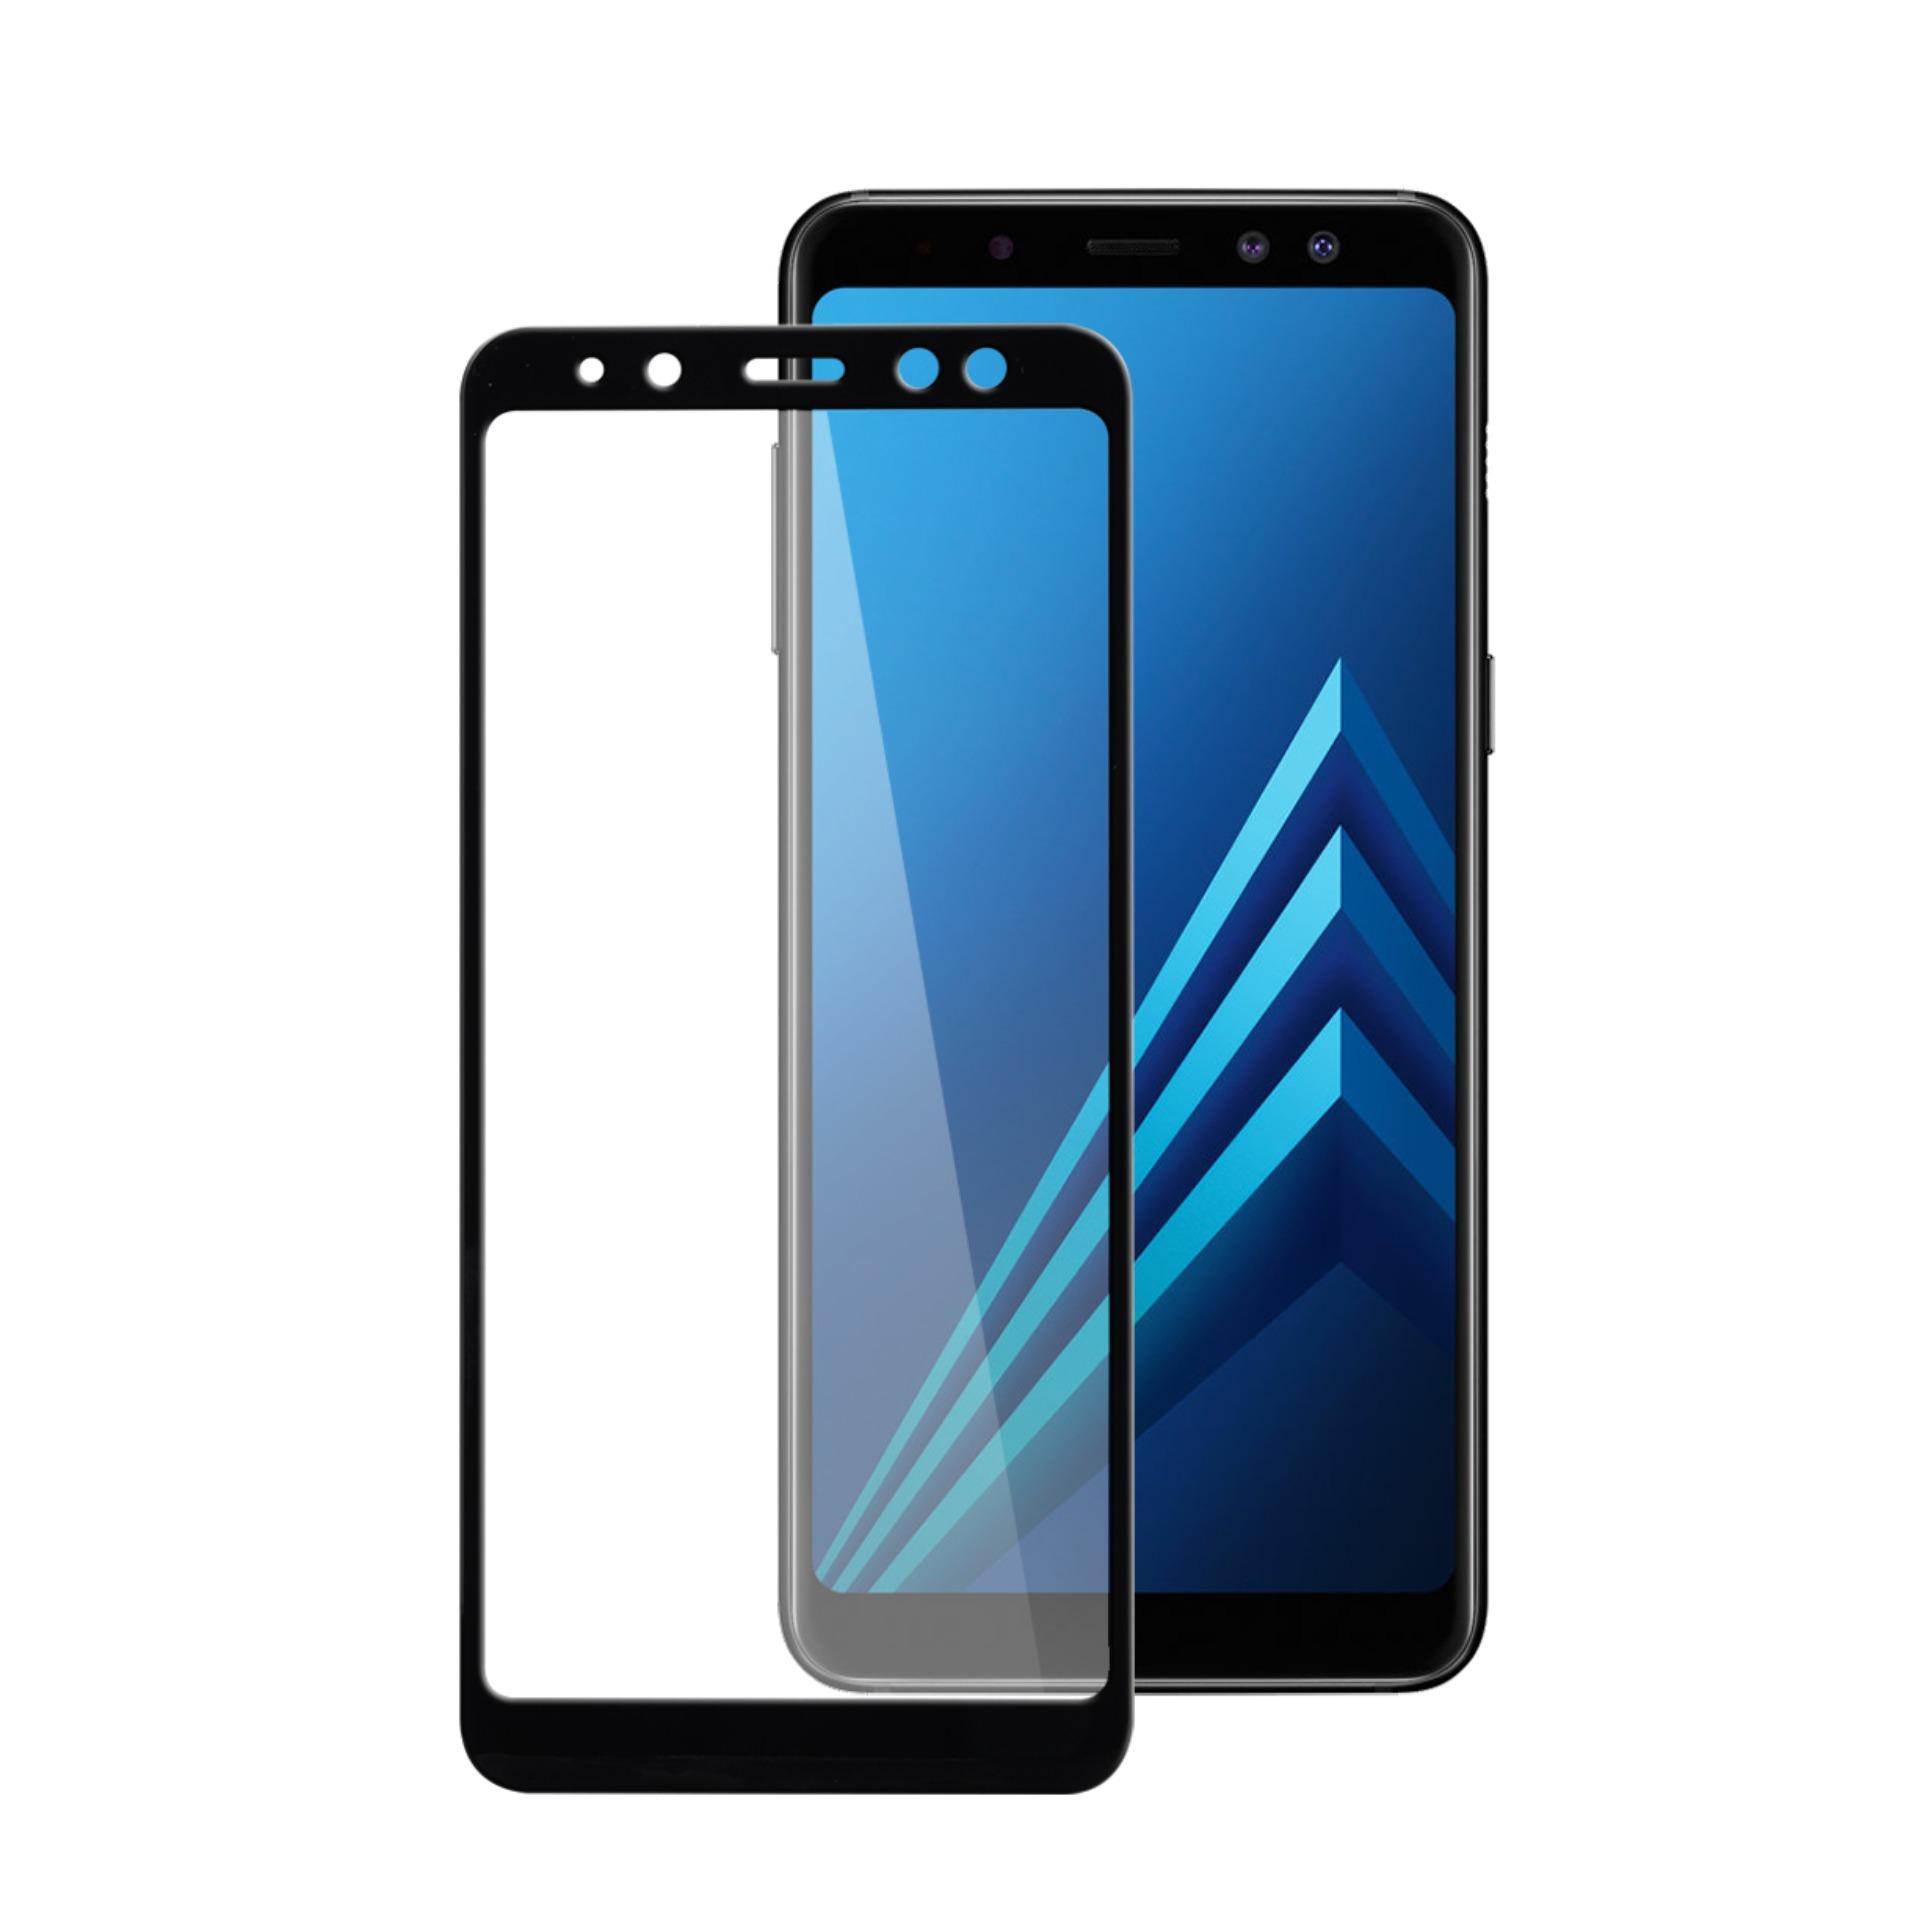 Vn Full Cover Samsung Galaxy A8 2018 A530 4G LTE Duos